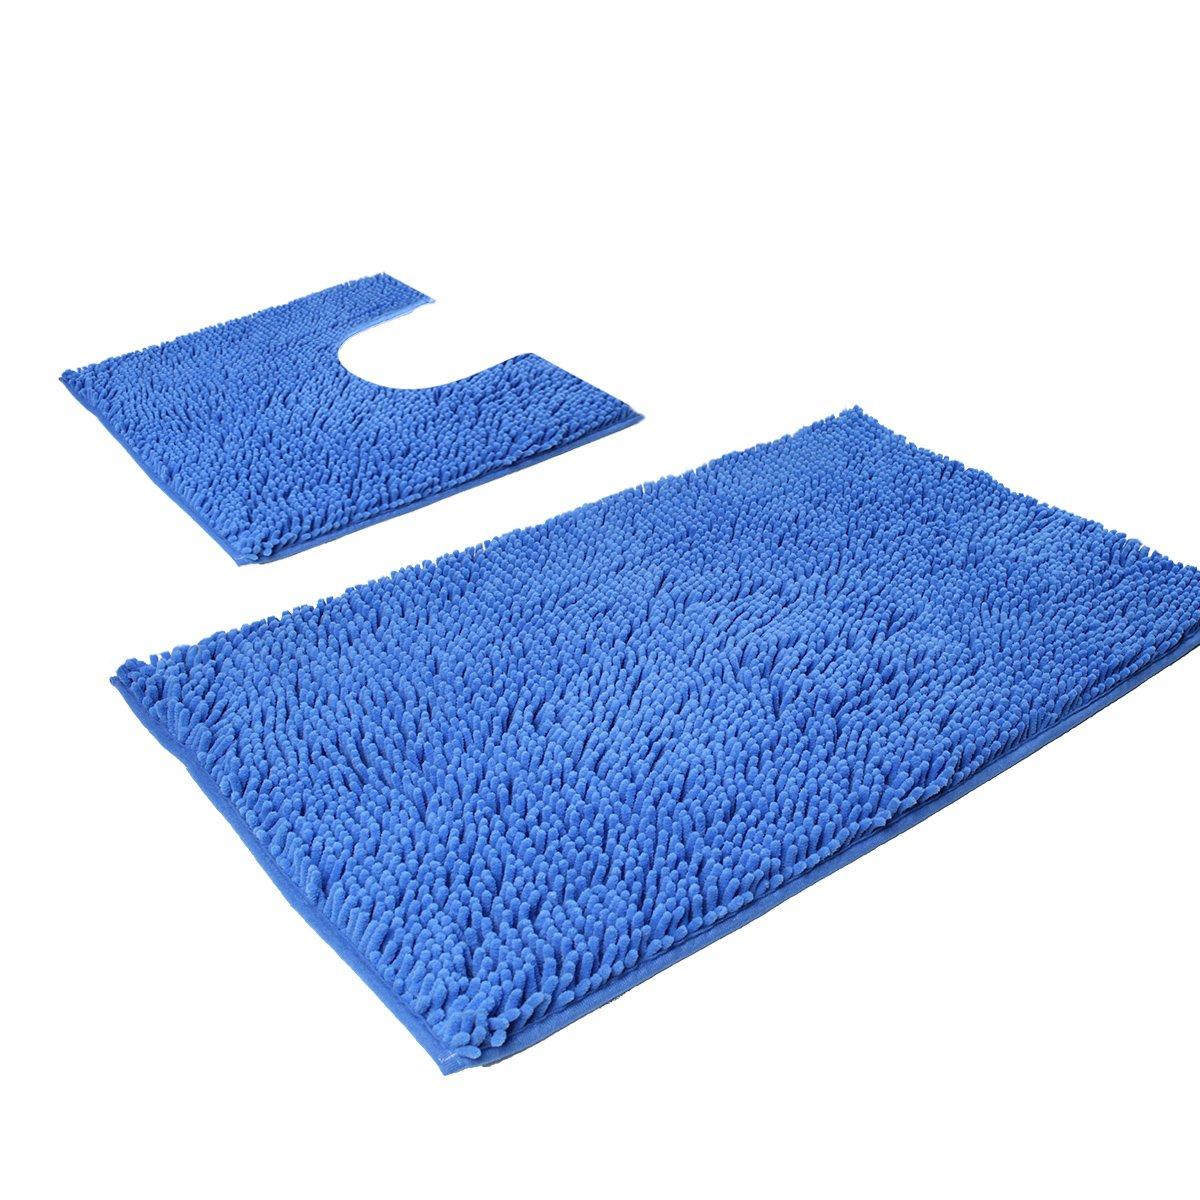 VDOMUS Microfiber Bathroom Contour Rugs Combo Set of 2 Soft Shaggy ...